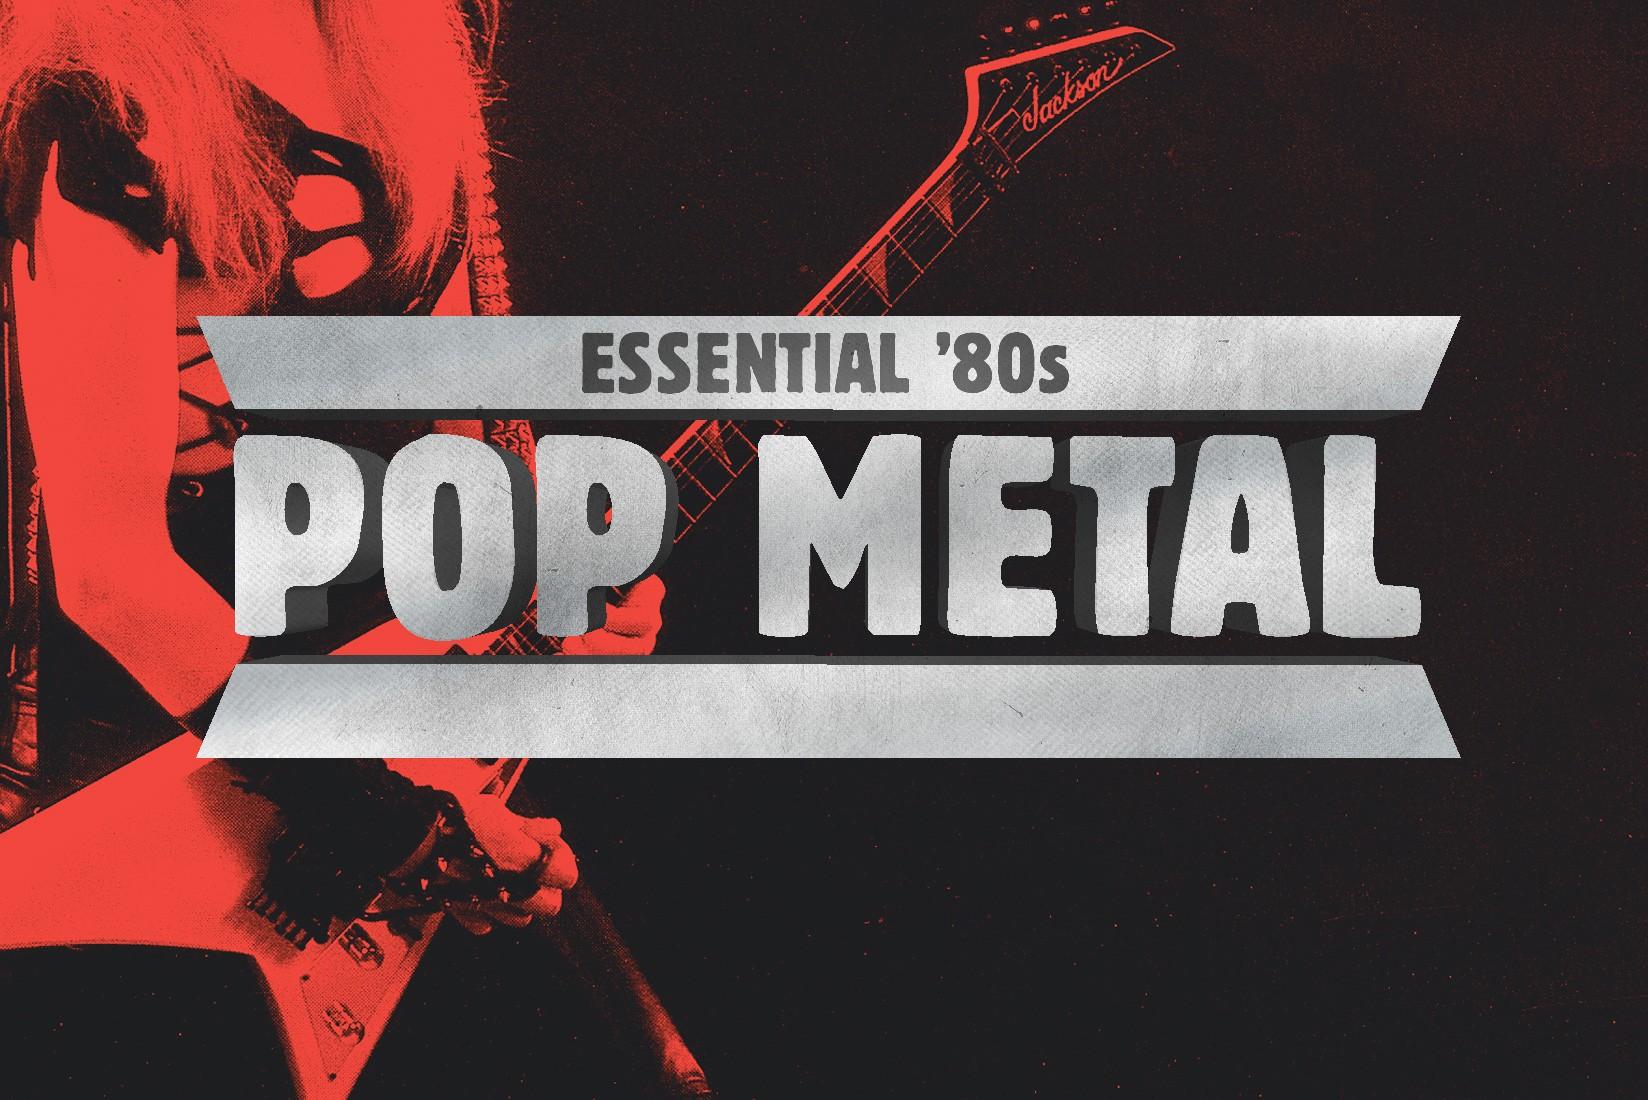 36 Essential '80s Pop Metal Tracks - Stereogum